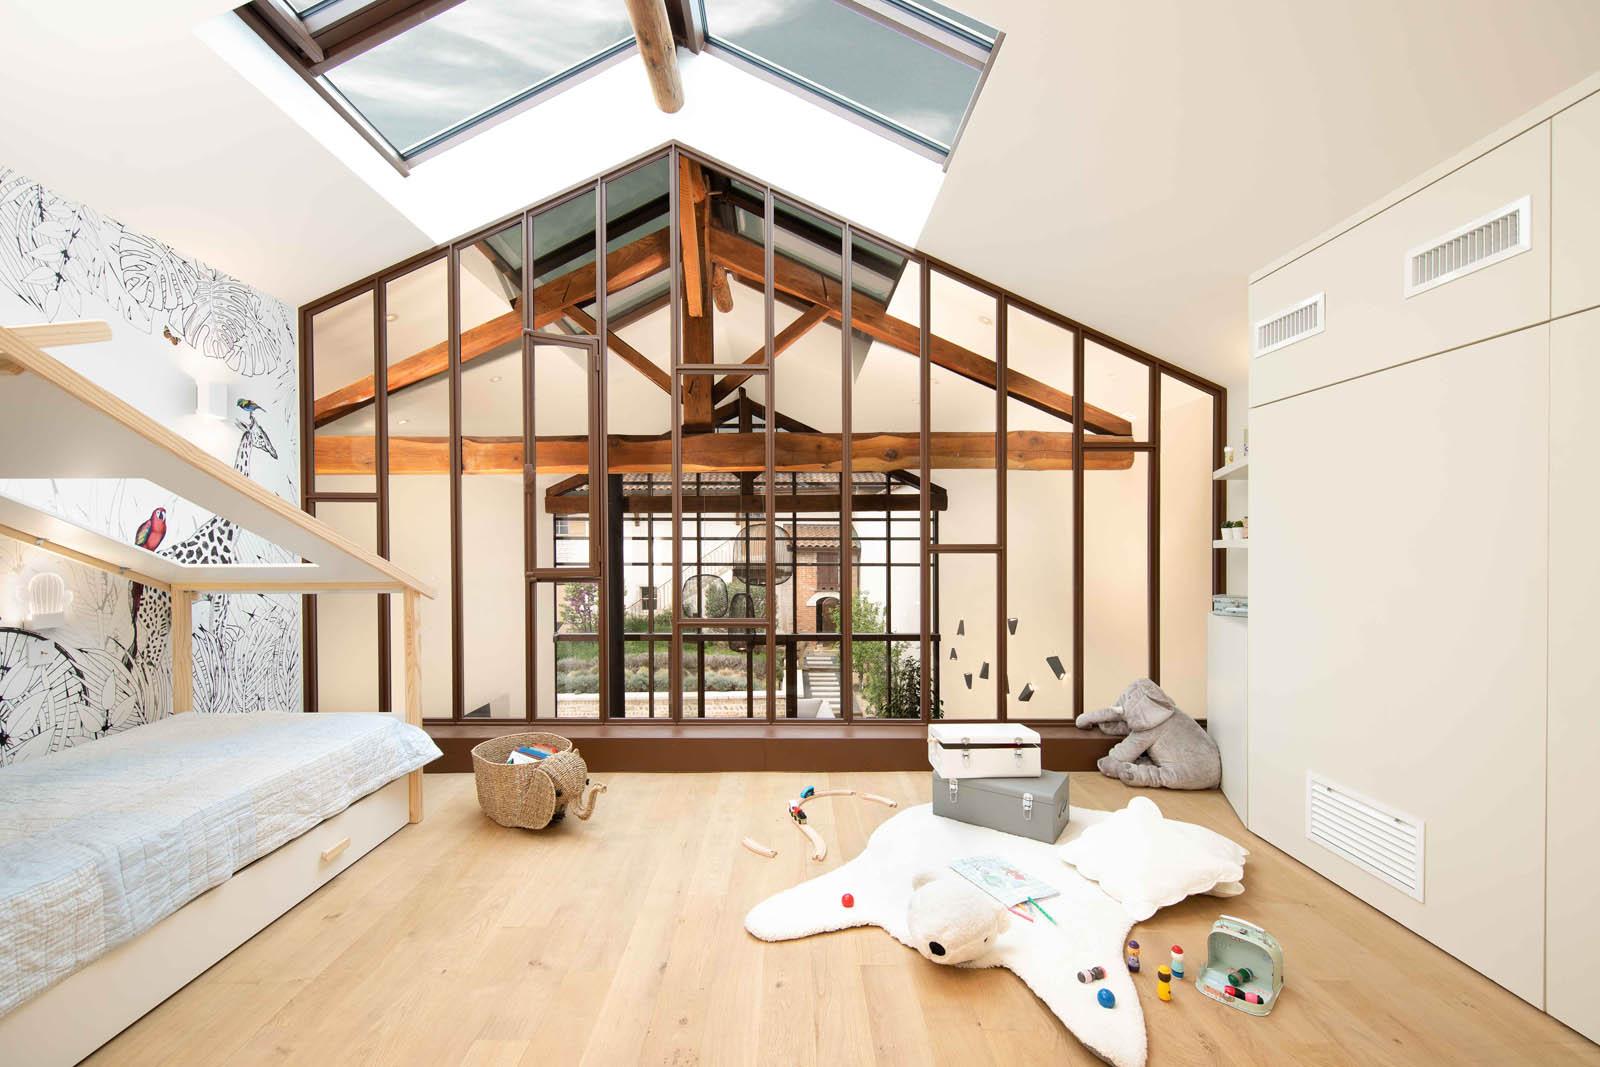 07_renovation-interieur_Invivhome-Idésia ©StudioRobinIssartel